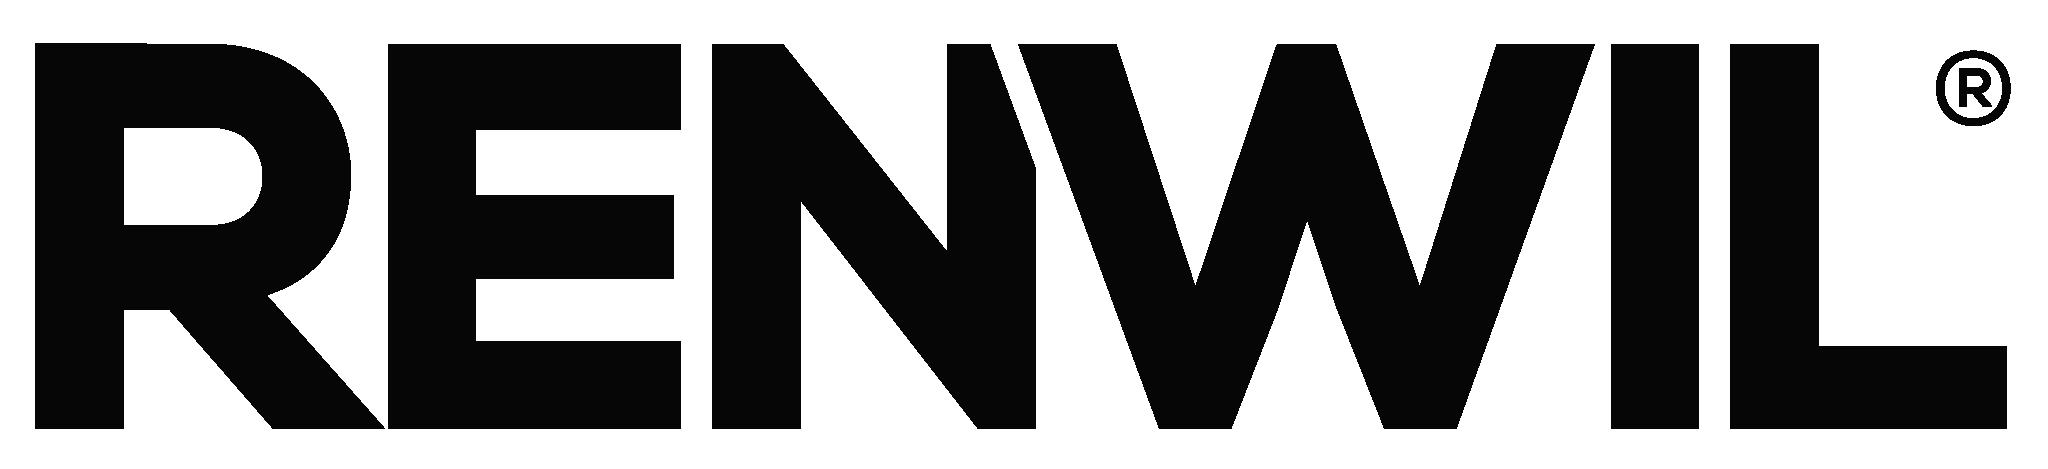 renwil_logo_blk.png